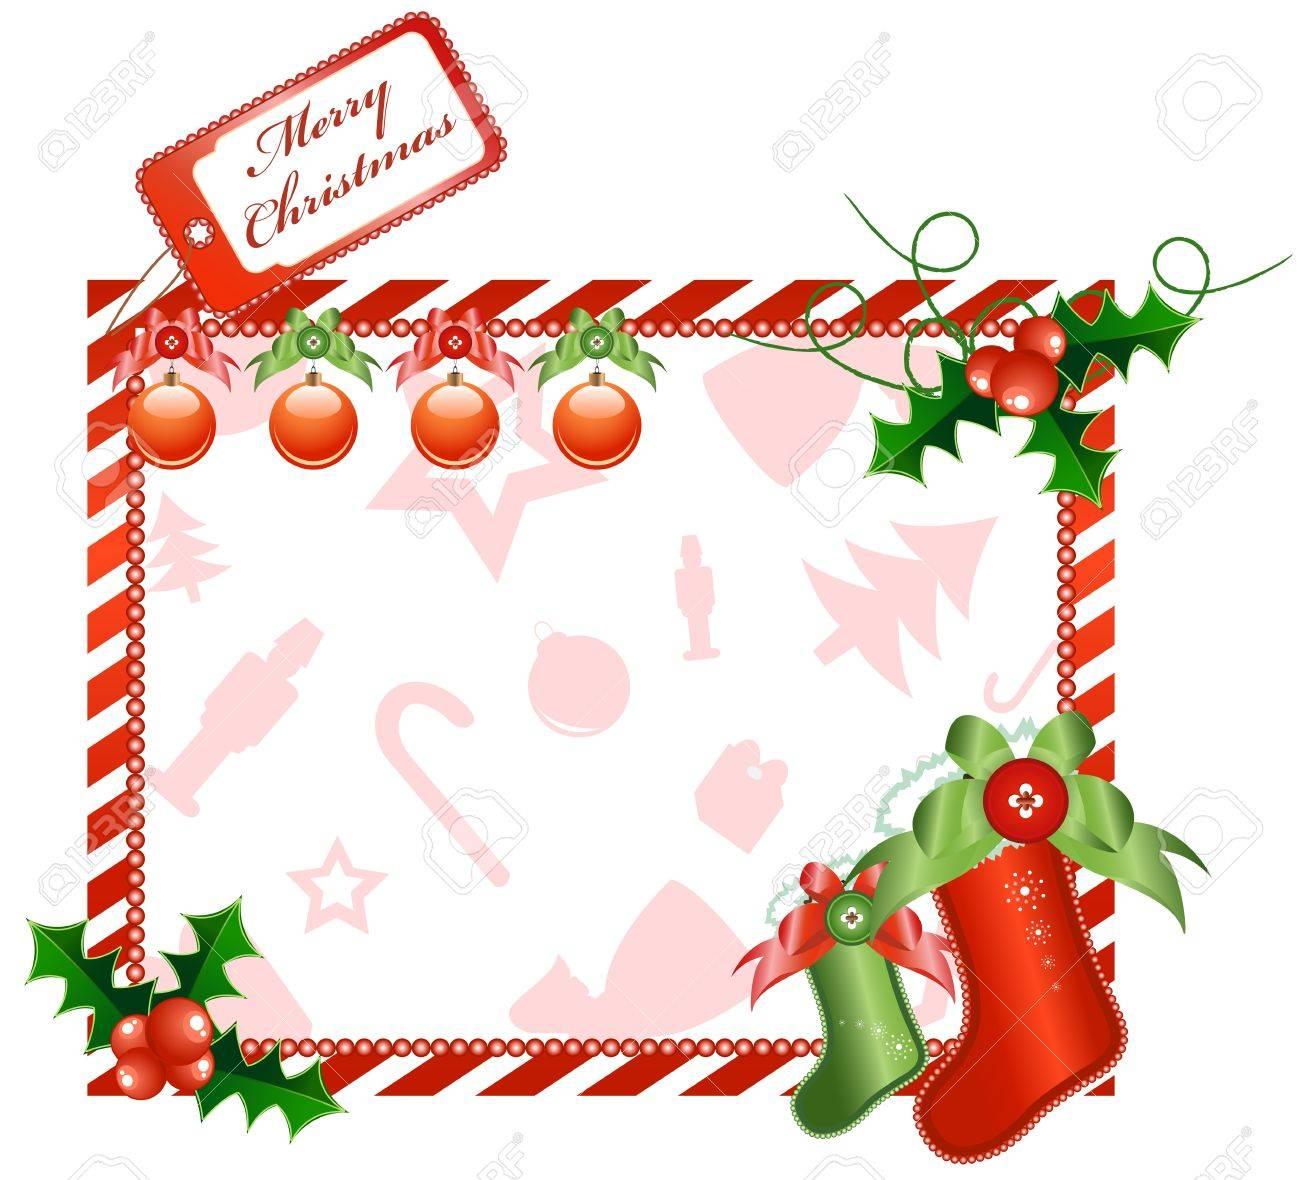 Vector Christmas horizontal card with european holly and socks Stock Vector - 11664047